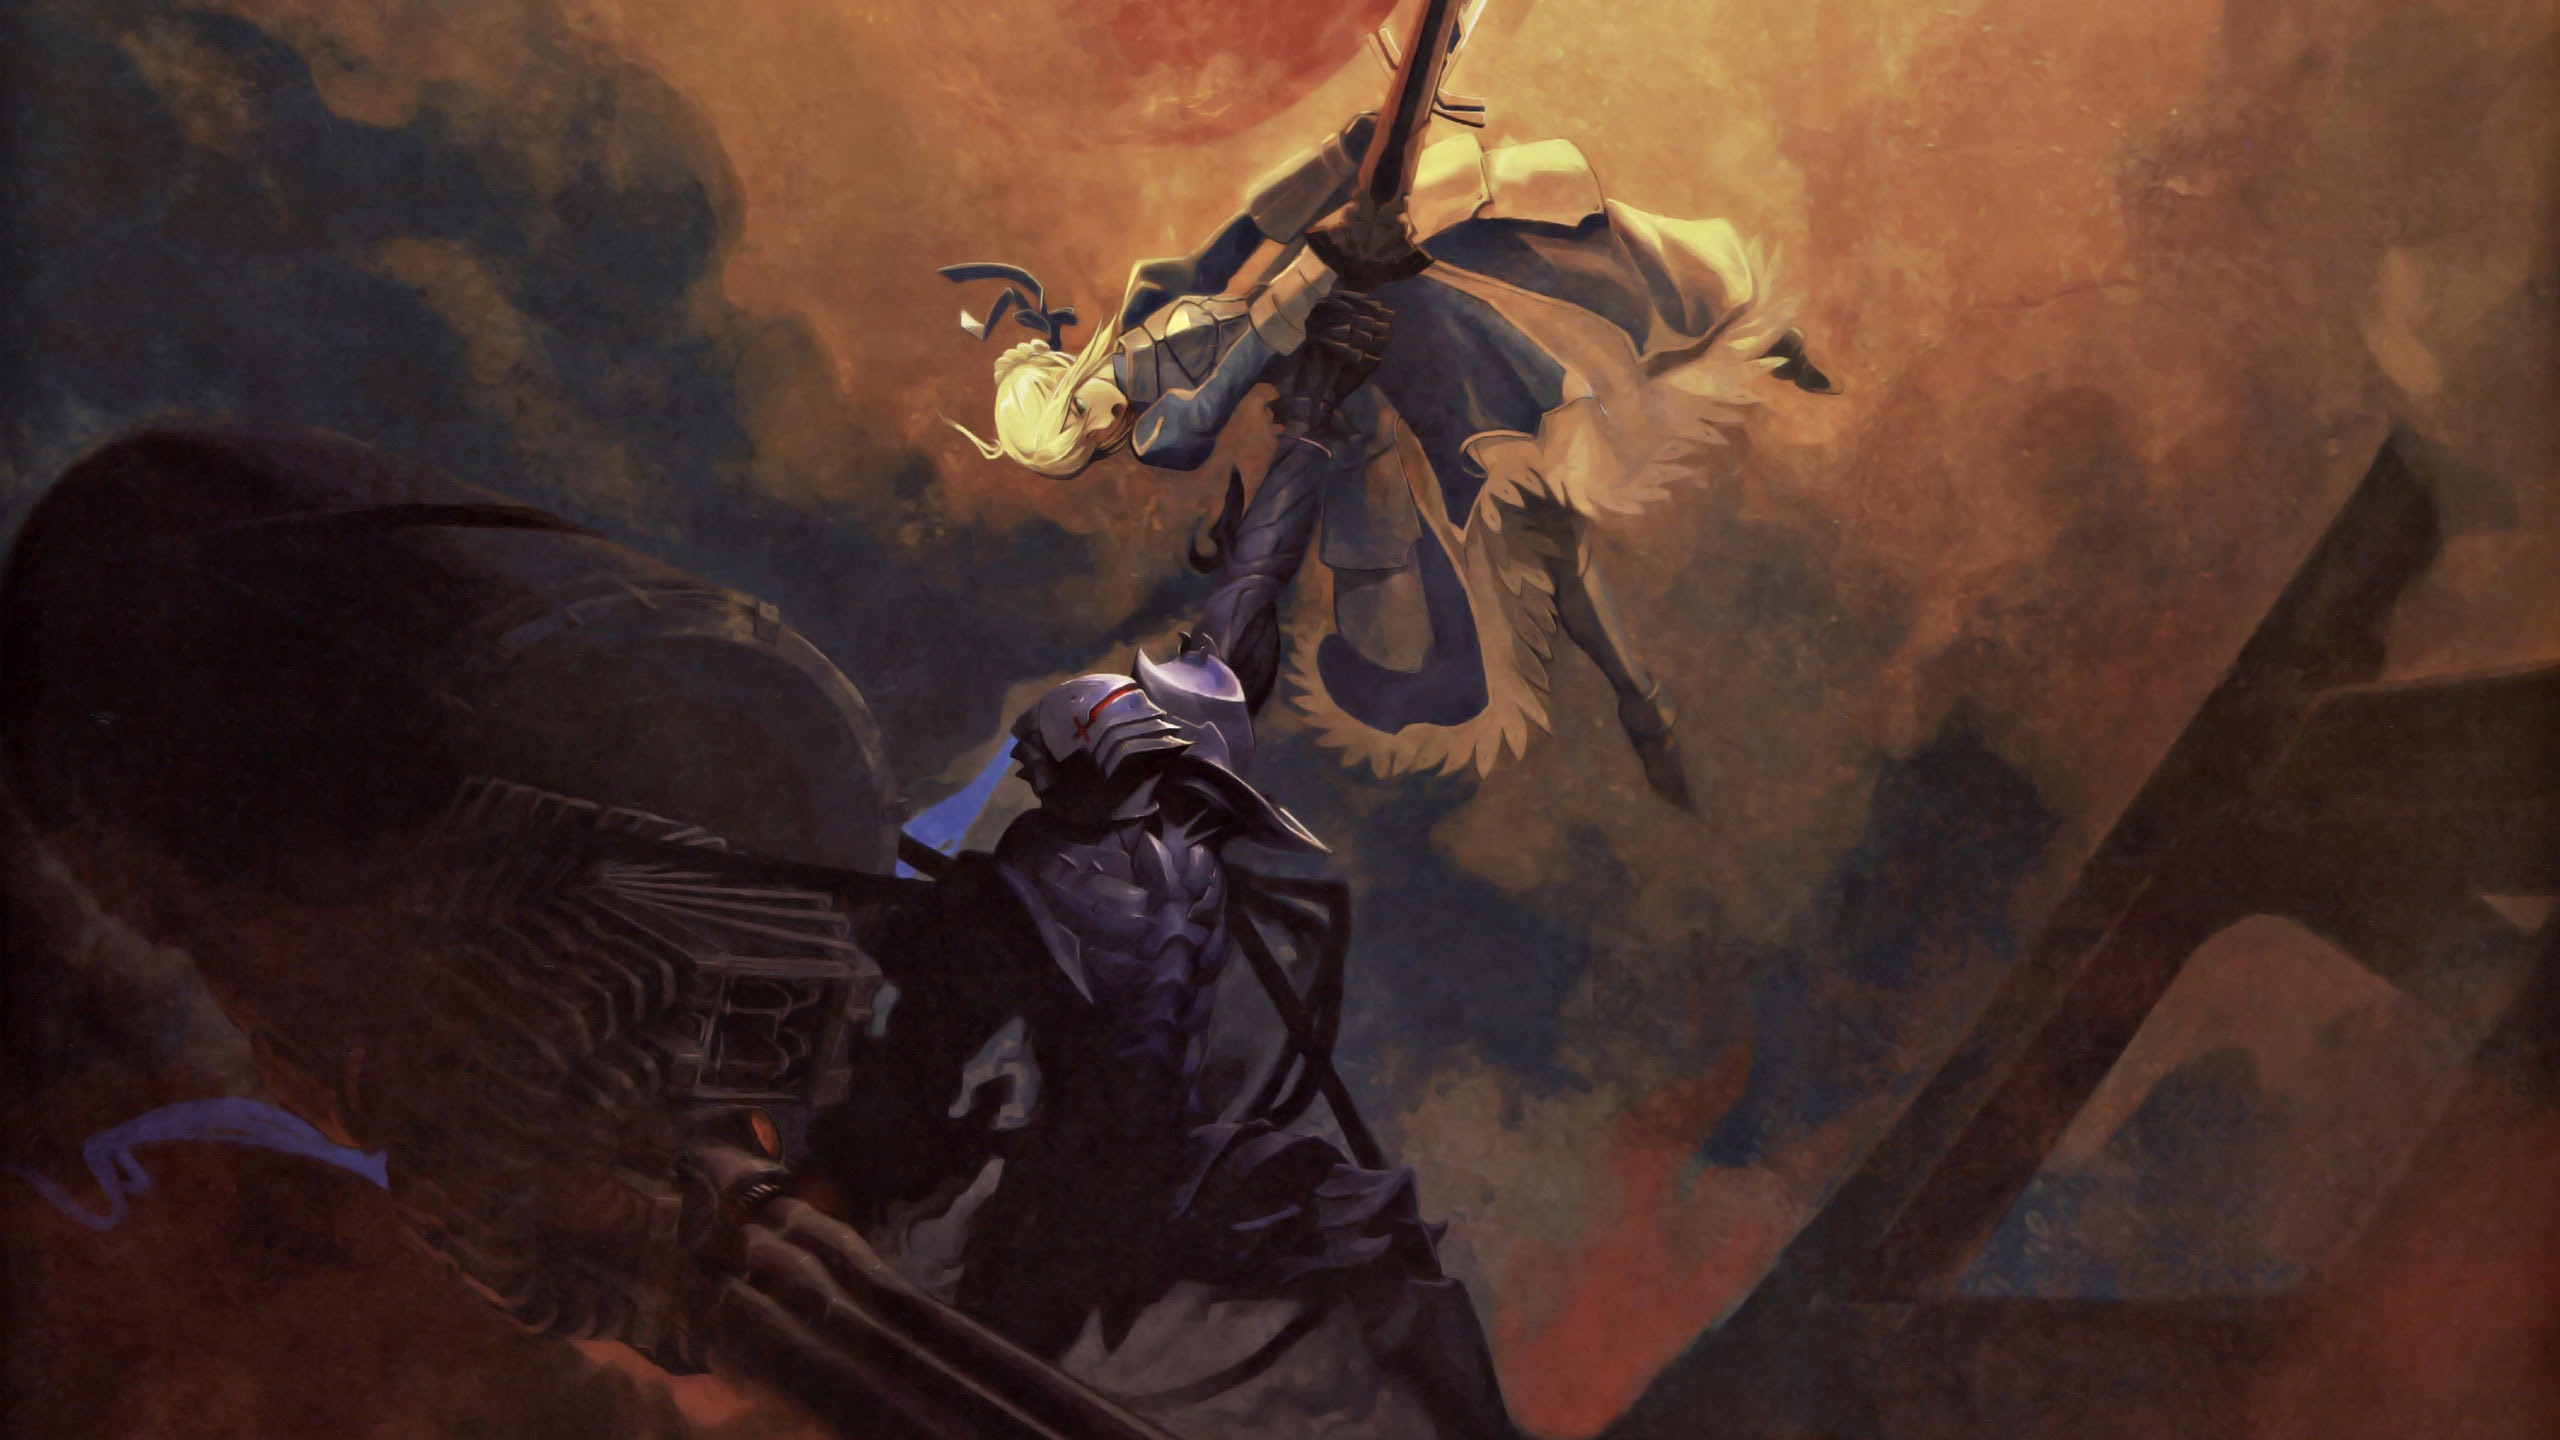 Fate Zero Wallpaper HD - WallpaperSafari